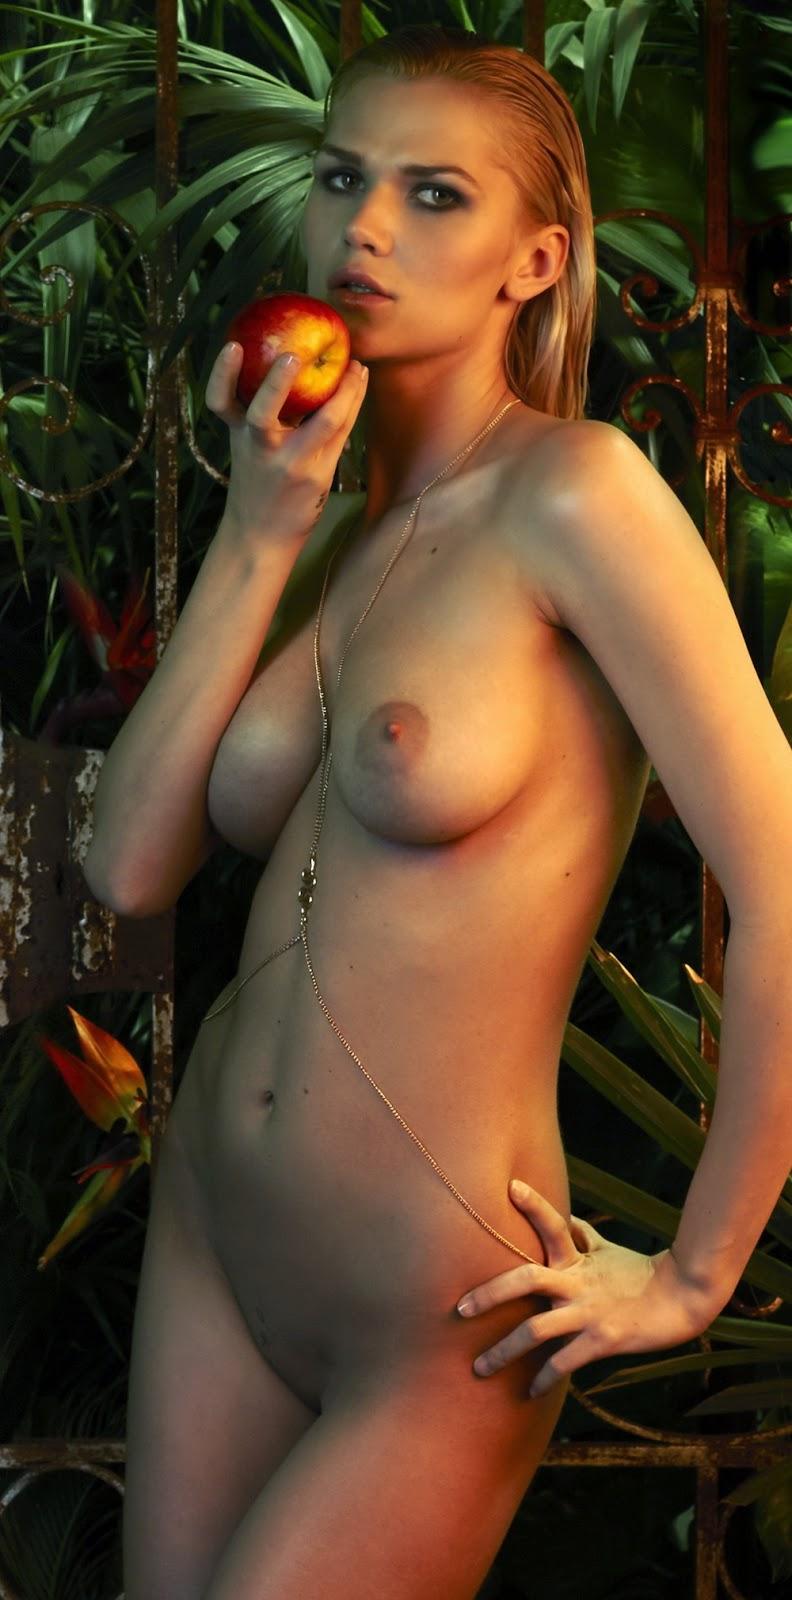 Series, Sara ashley nude think